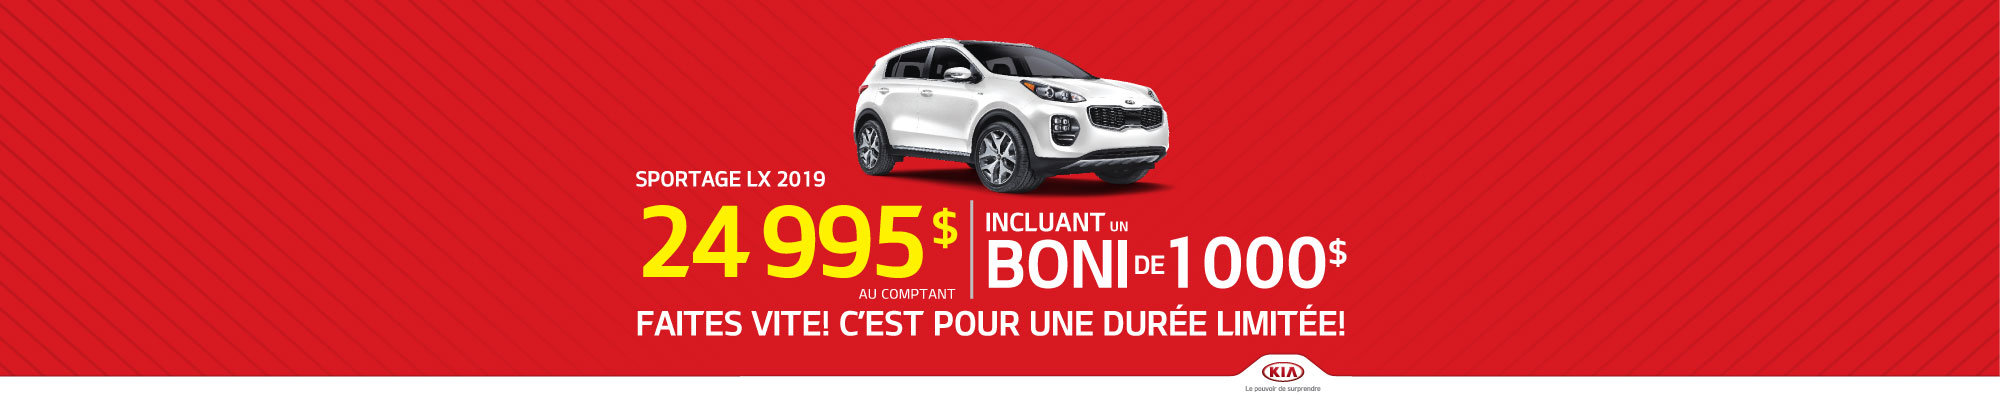 Le Sportage LX 2019 - Boni de 1 000$ inclus! (HEADER)